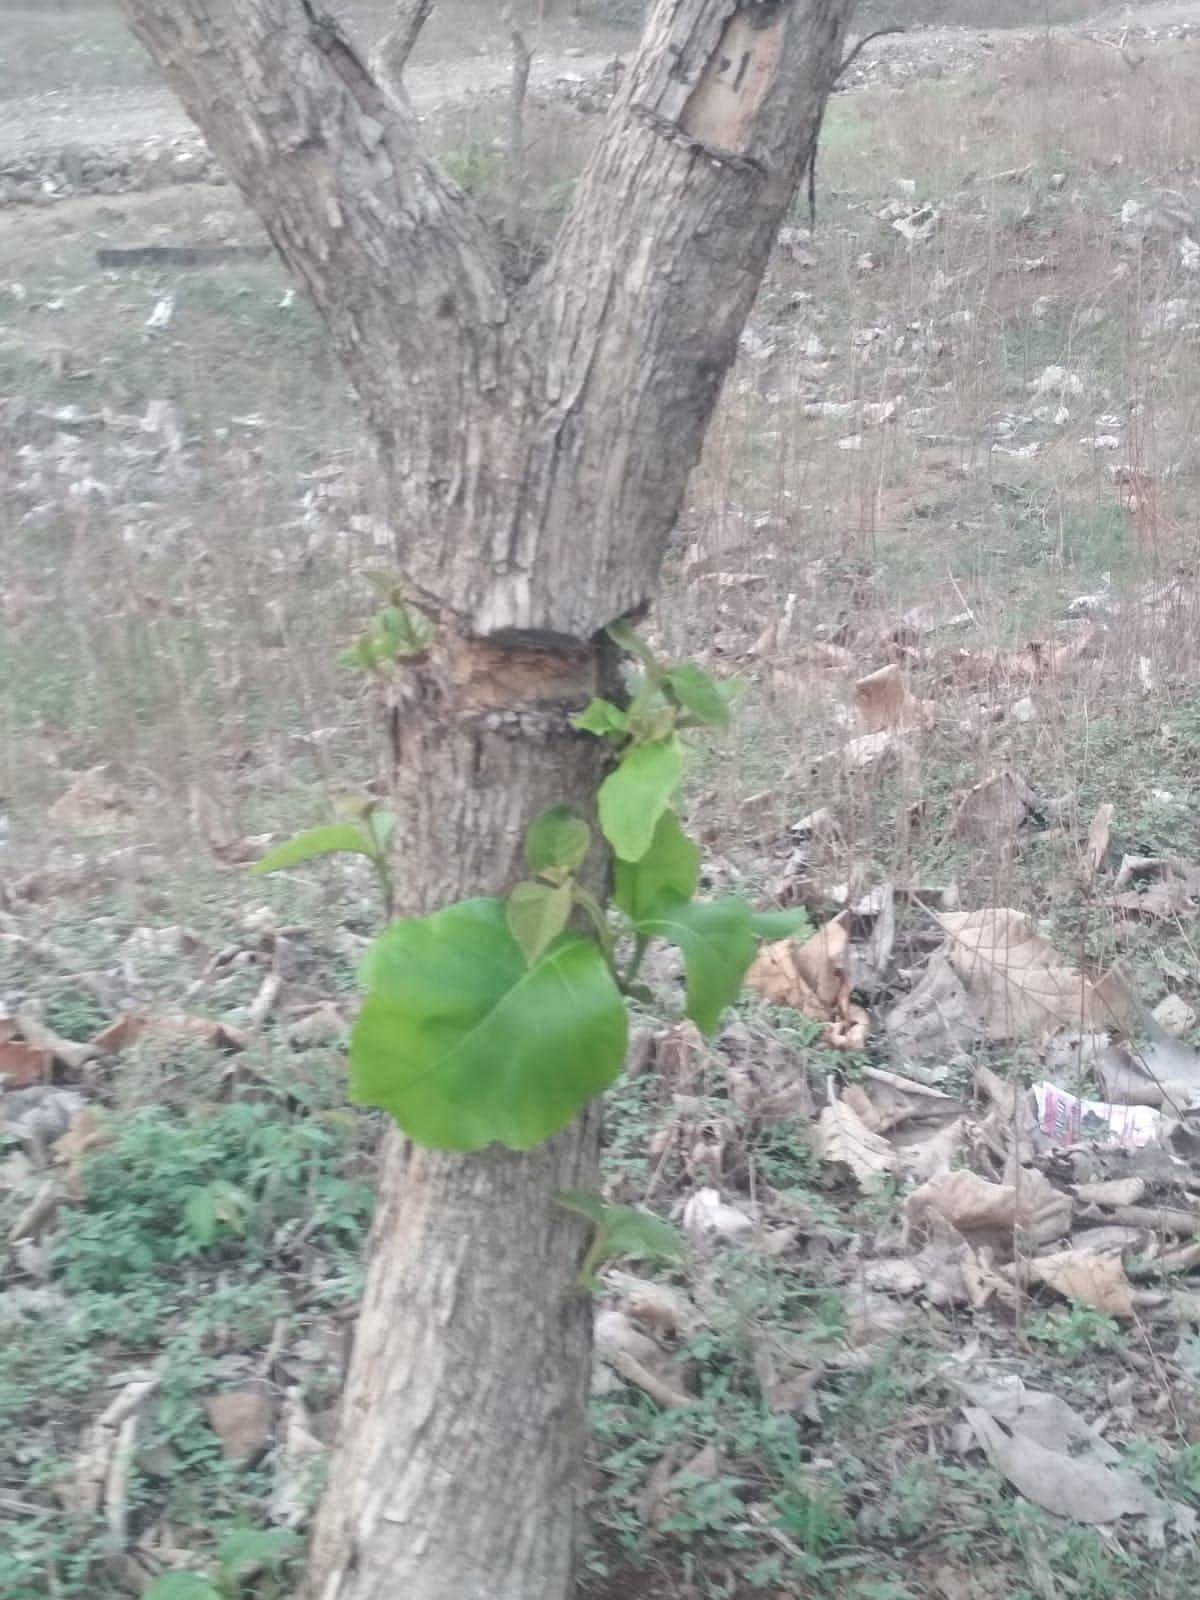 Indore: Sagwan, Shisham trees cut in Gajinda and Gavalu forest area; Timber mafia has once again become active in Choral